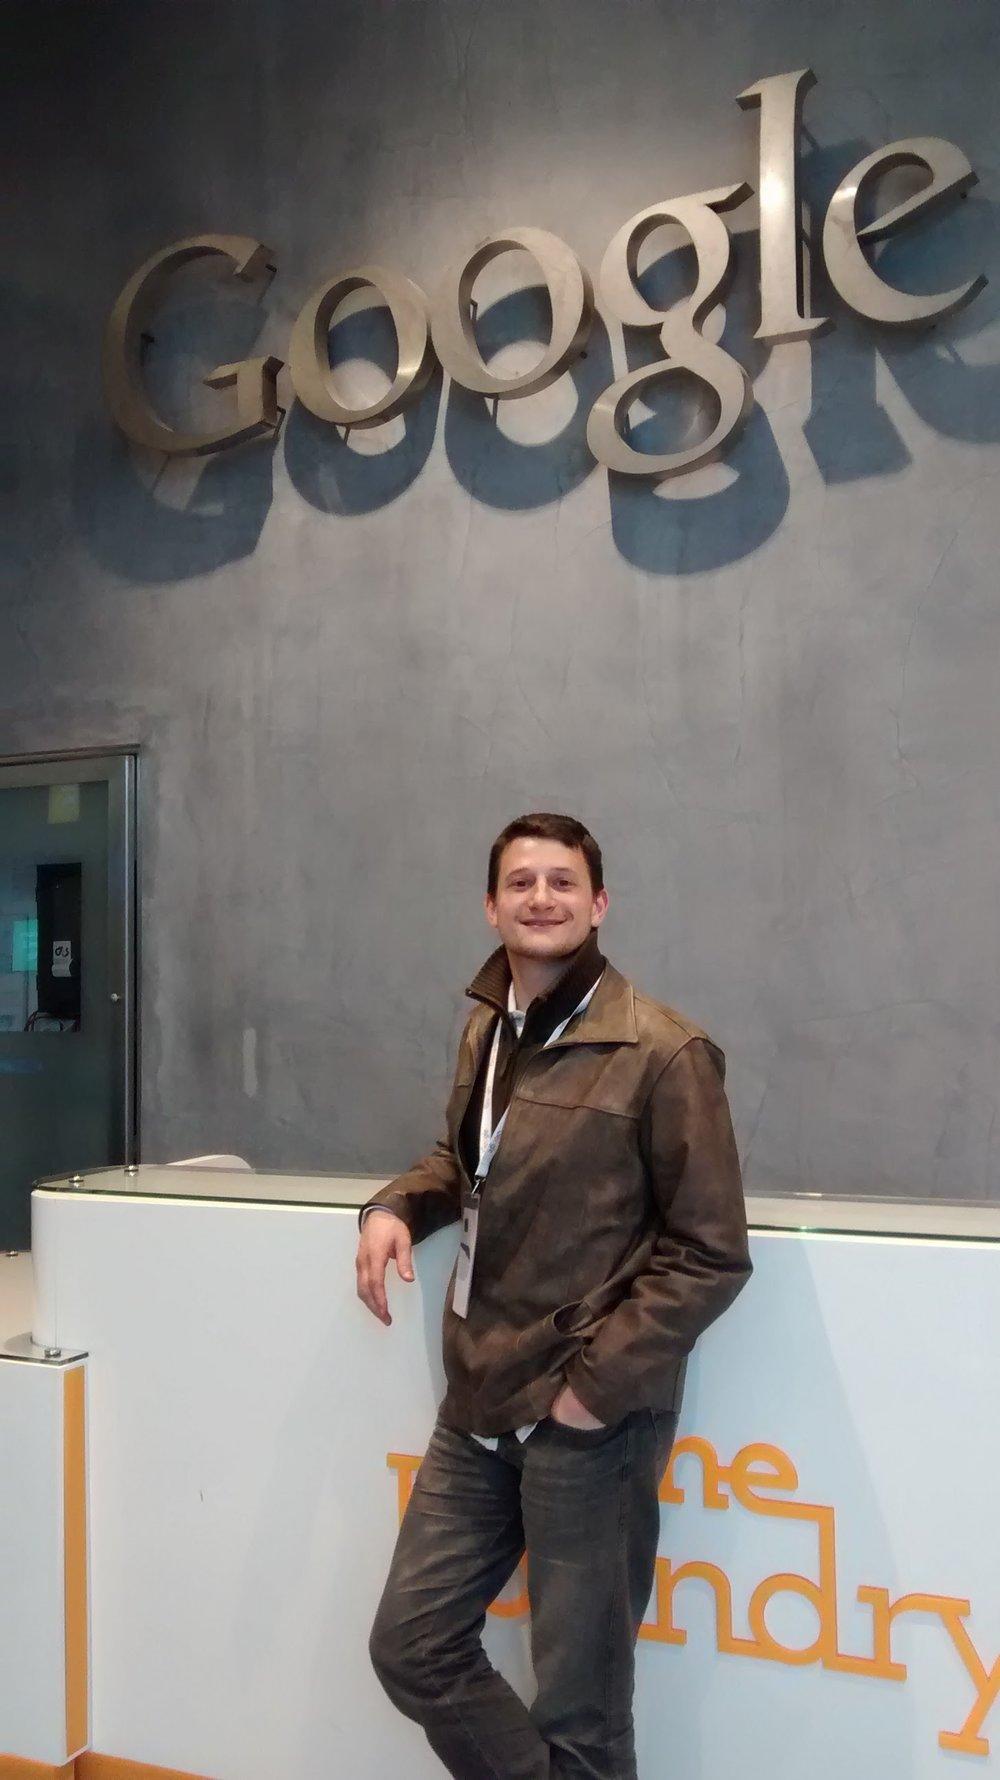 Google Dublin, Irlanda